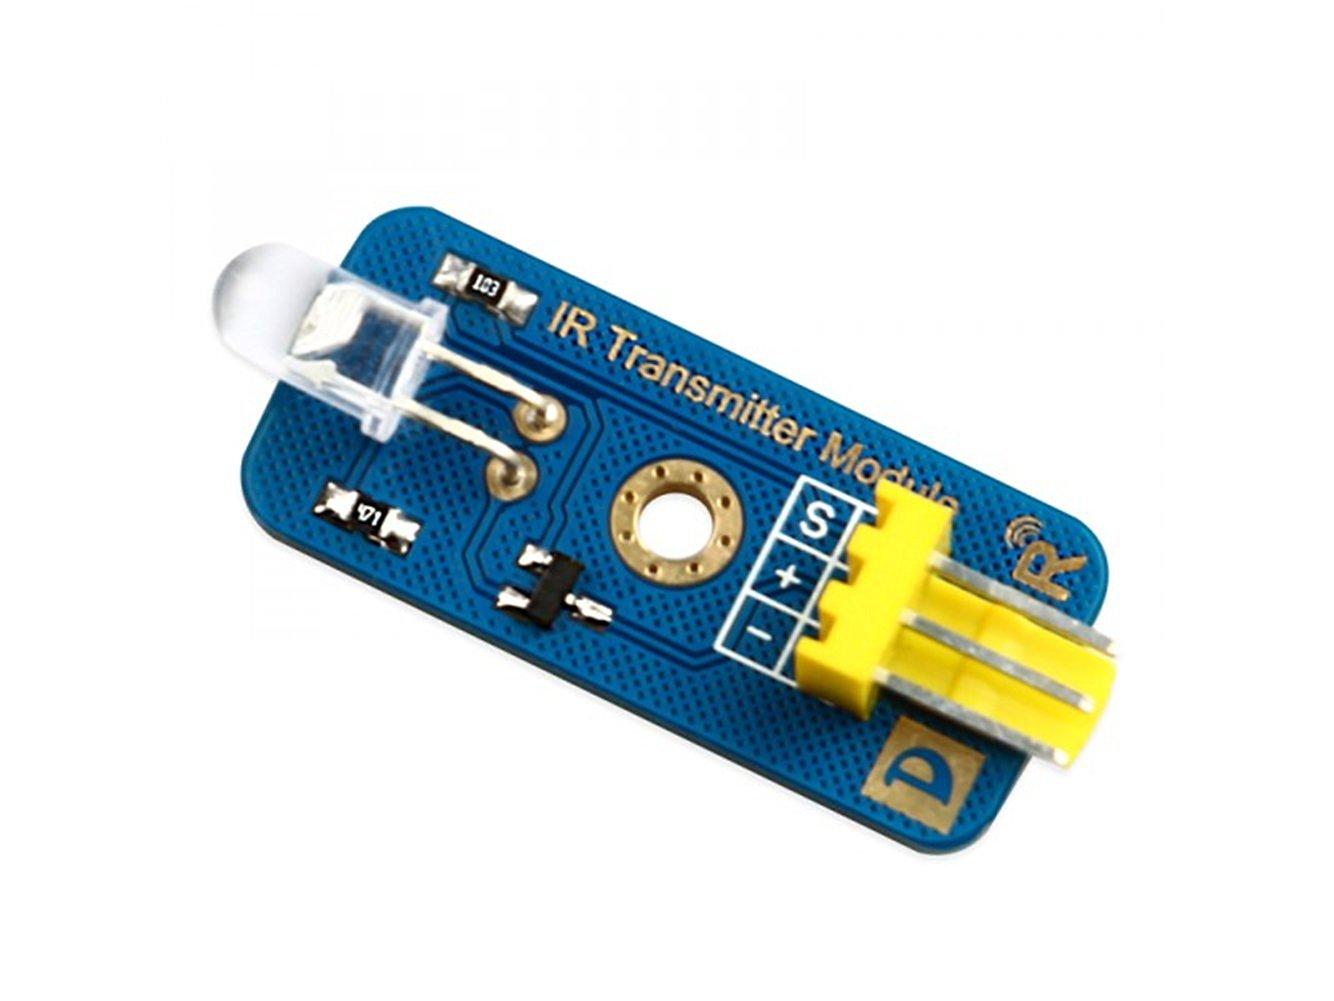 Cheap Ir Module Irkd166 16 Find Deals On Line Infrared Transmitter Circuit Get Quotations For Arduino Controller